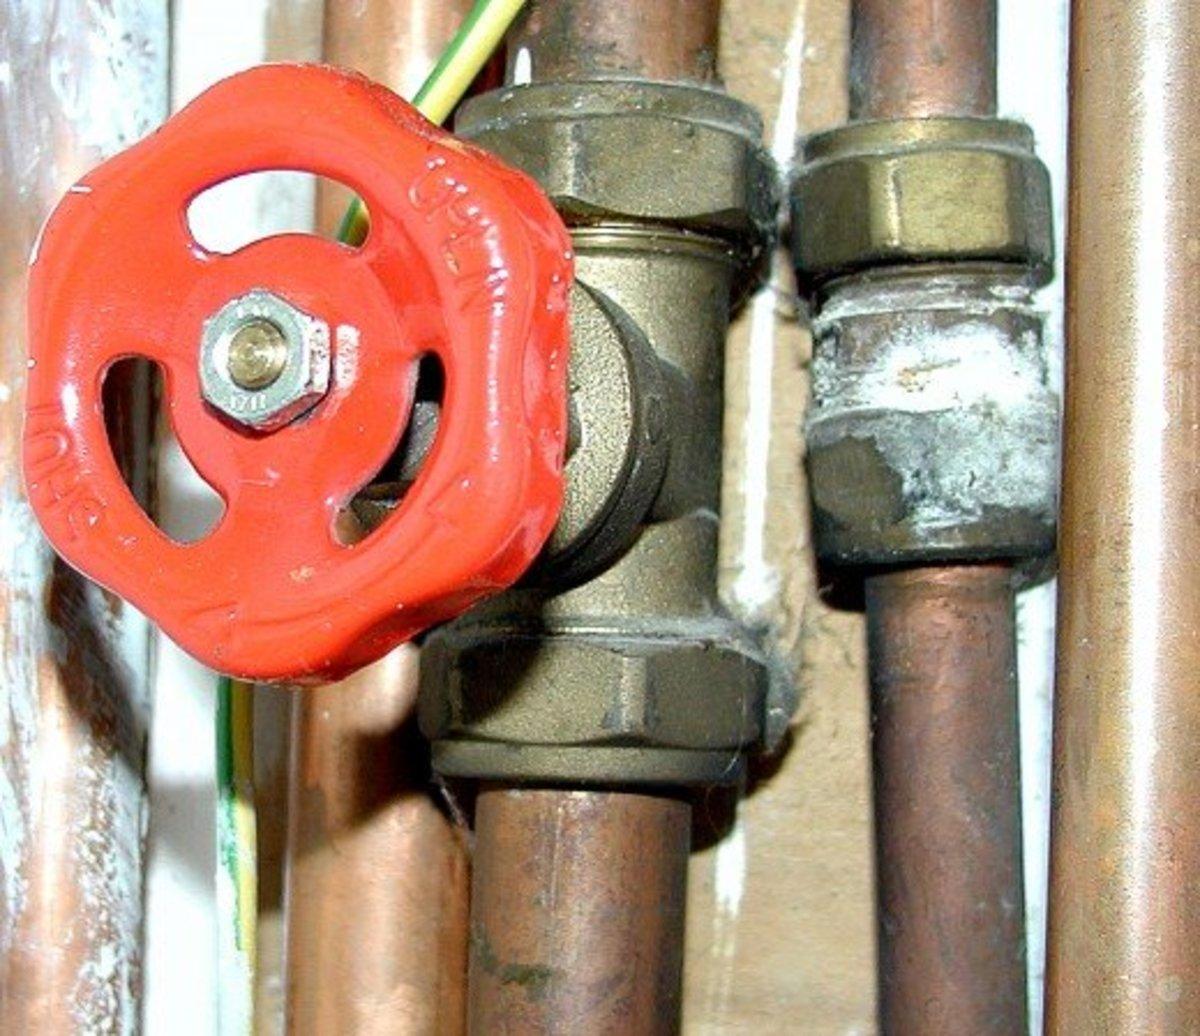 Gate valve - Turn fully clockwise for off